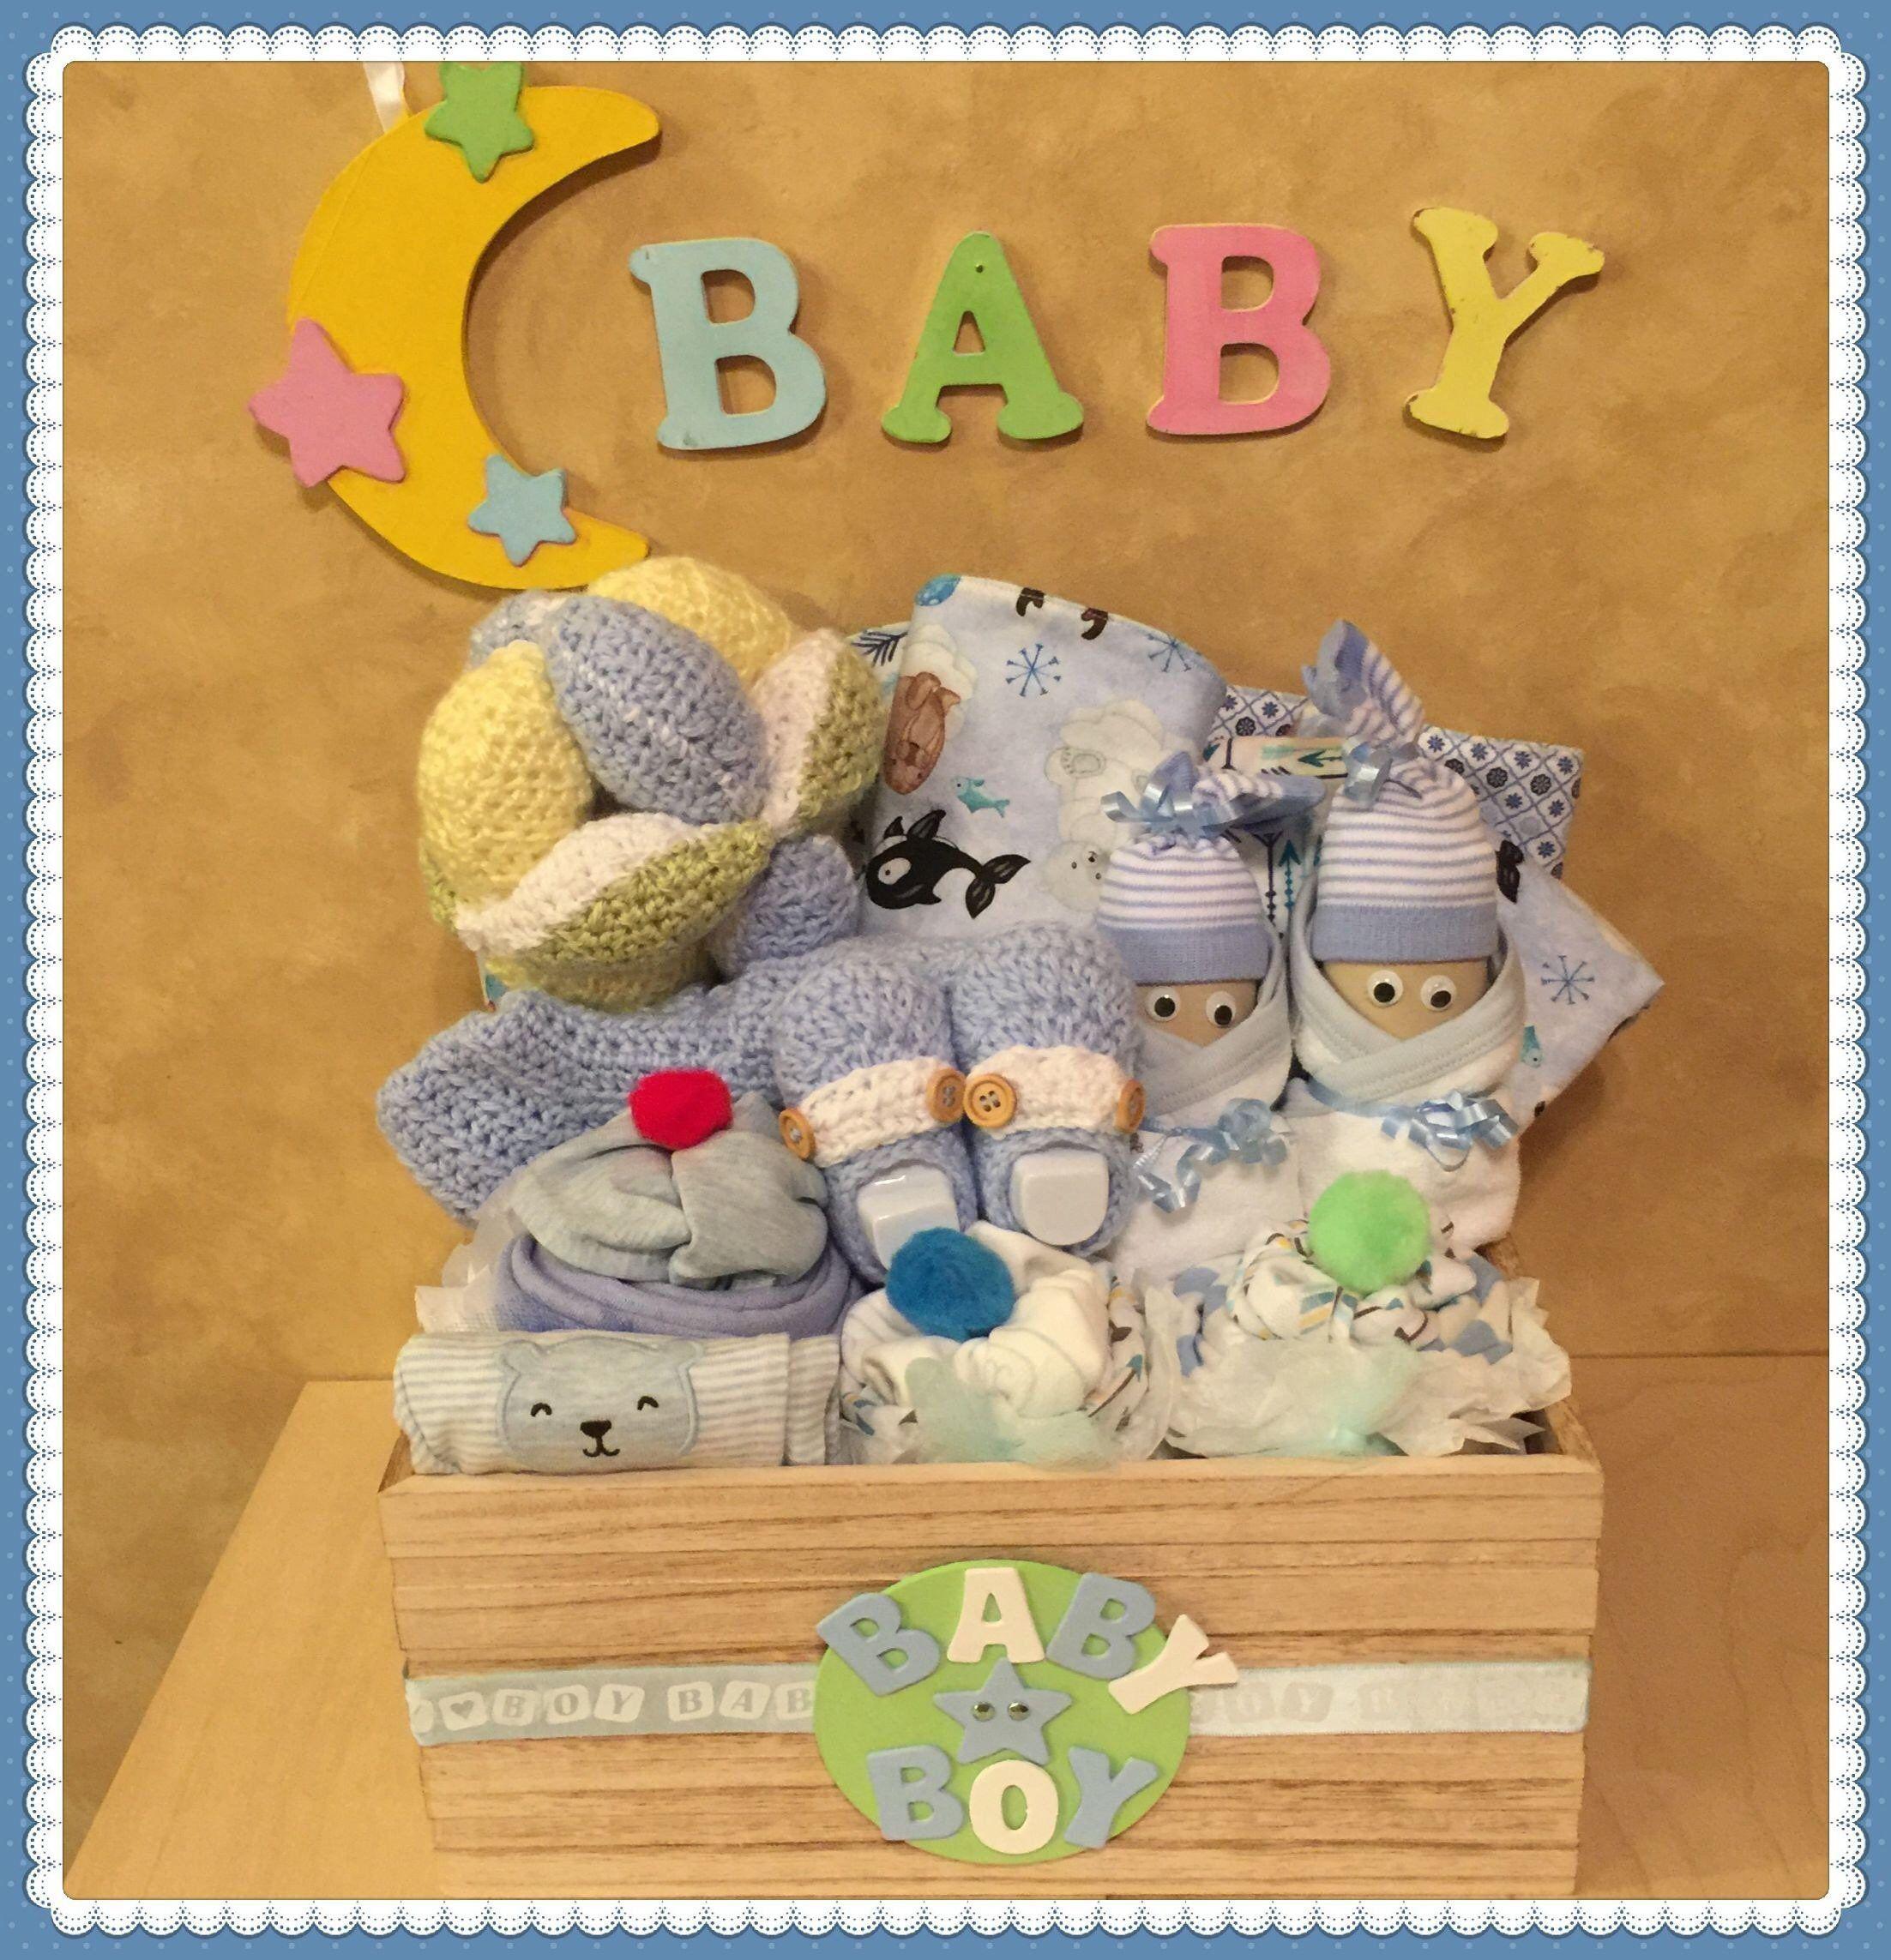 Baby boy gift basketnewborn baby gift basketcorporate baby